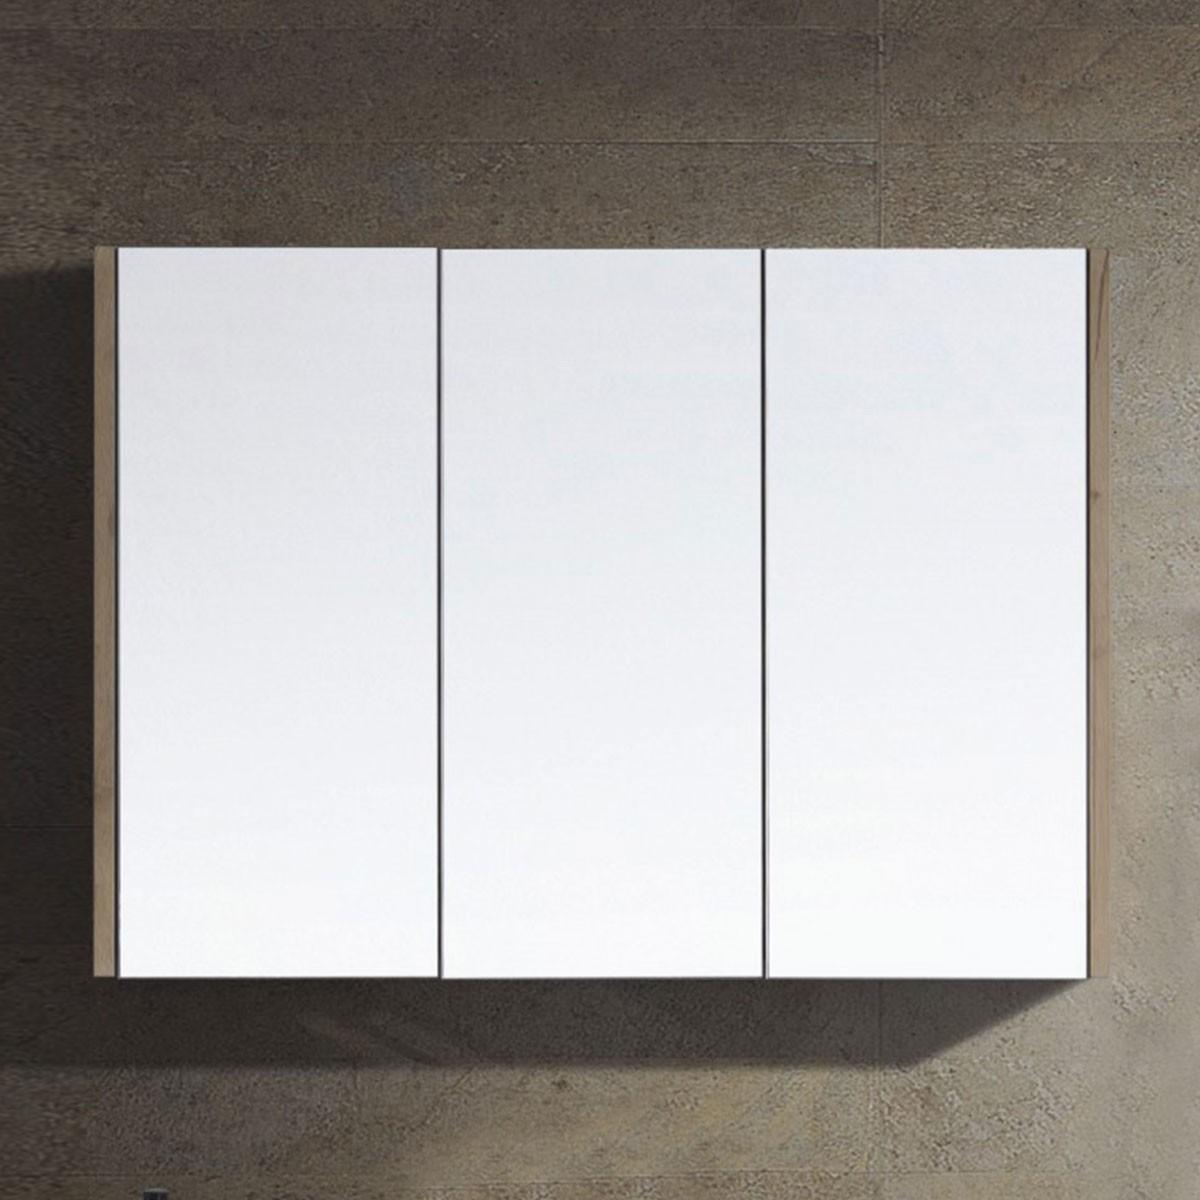 35 x 26 In Mirror Cabinet (TP1002-M)